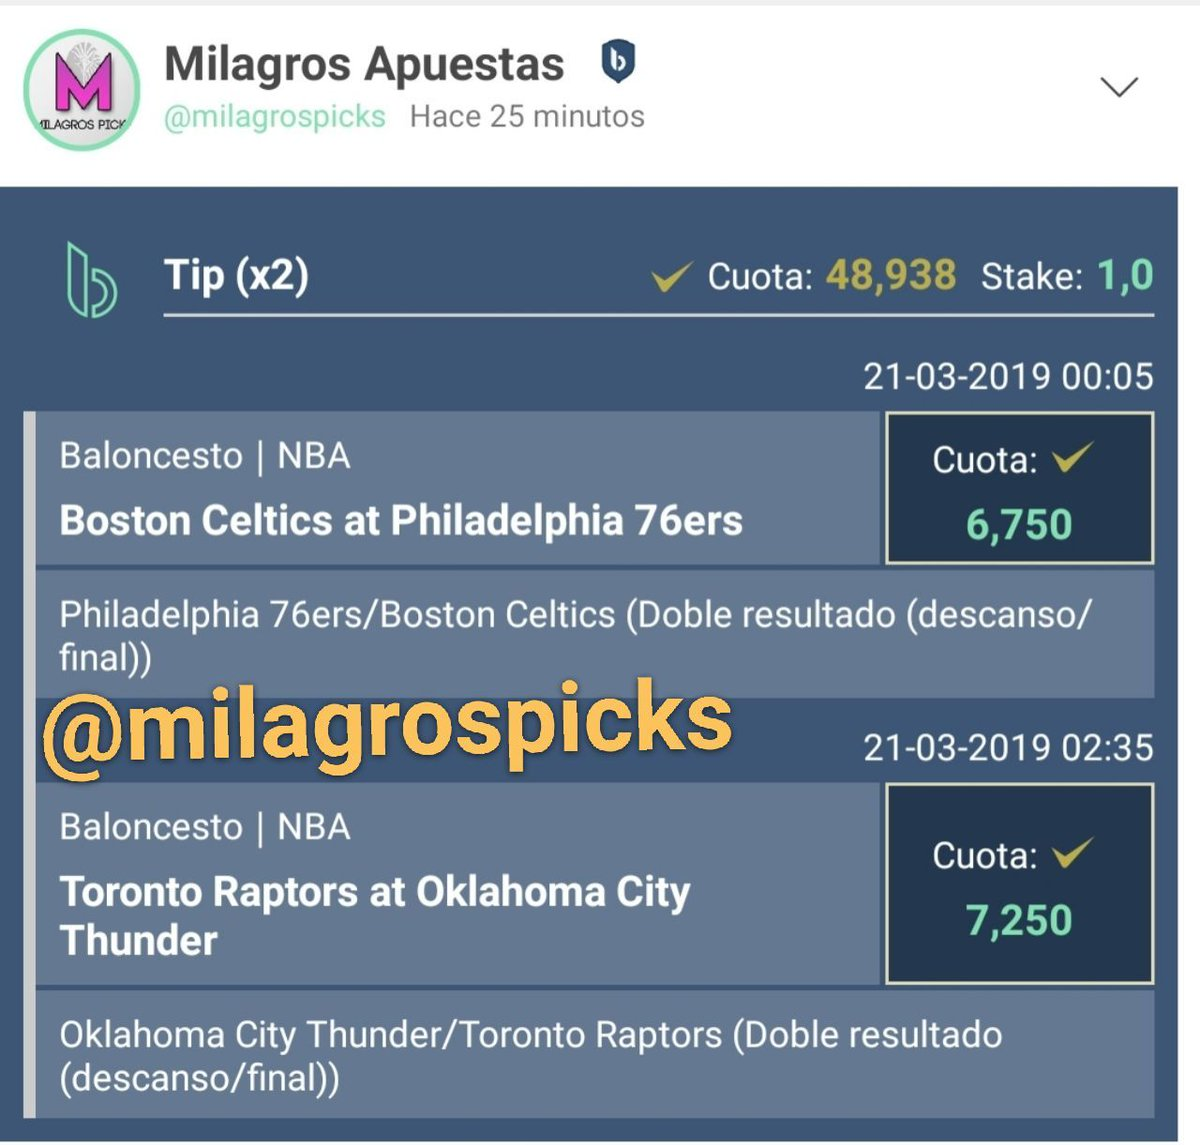 NBA   Combinada:  HT/FT: PHI Sixers/BOS Celtics  HT/FT: OKC Thunder/TOR Raptores   Cuota @48,93 - #FUNBET  <br>http://pic.twitter.com/sg0awTfZIg